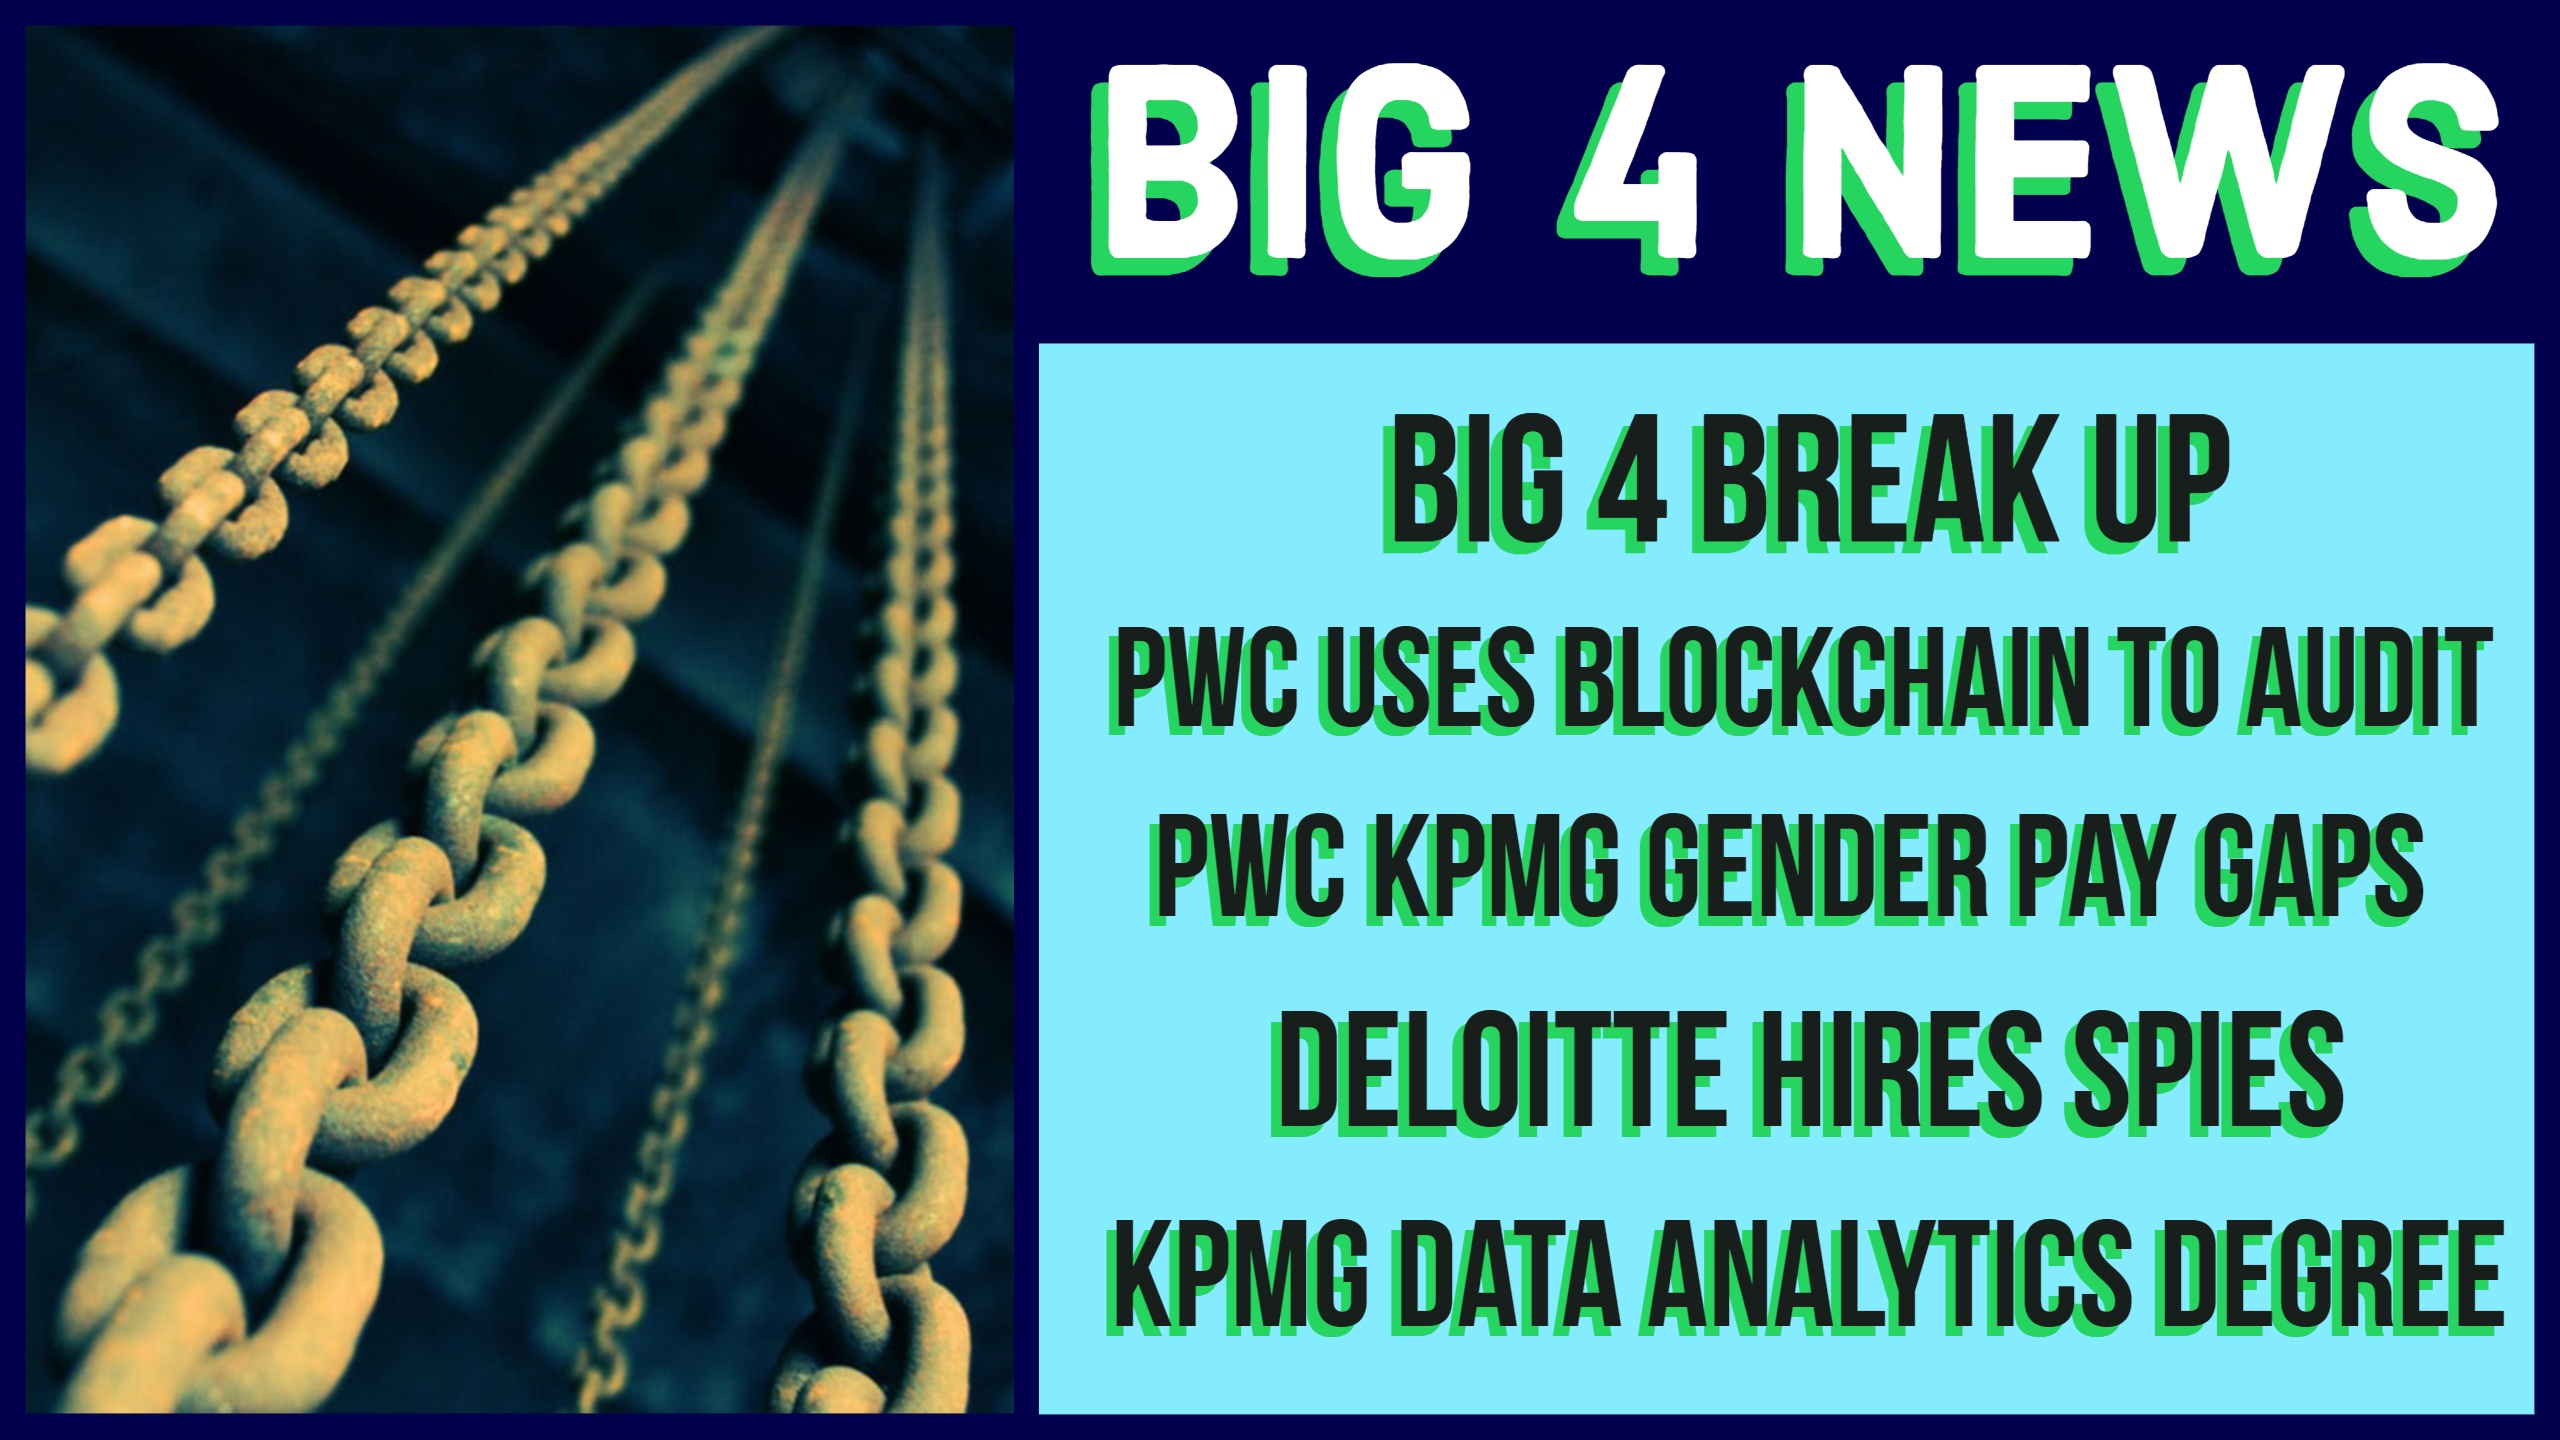 PwC Uses Blockchain to Audit